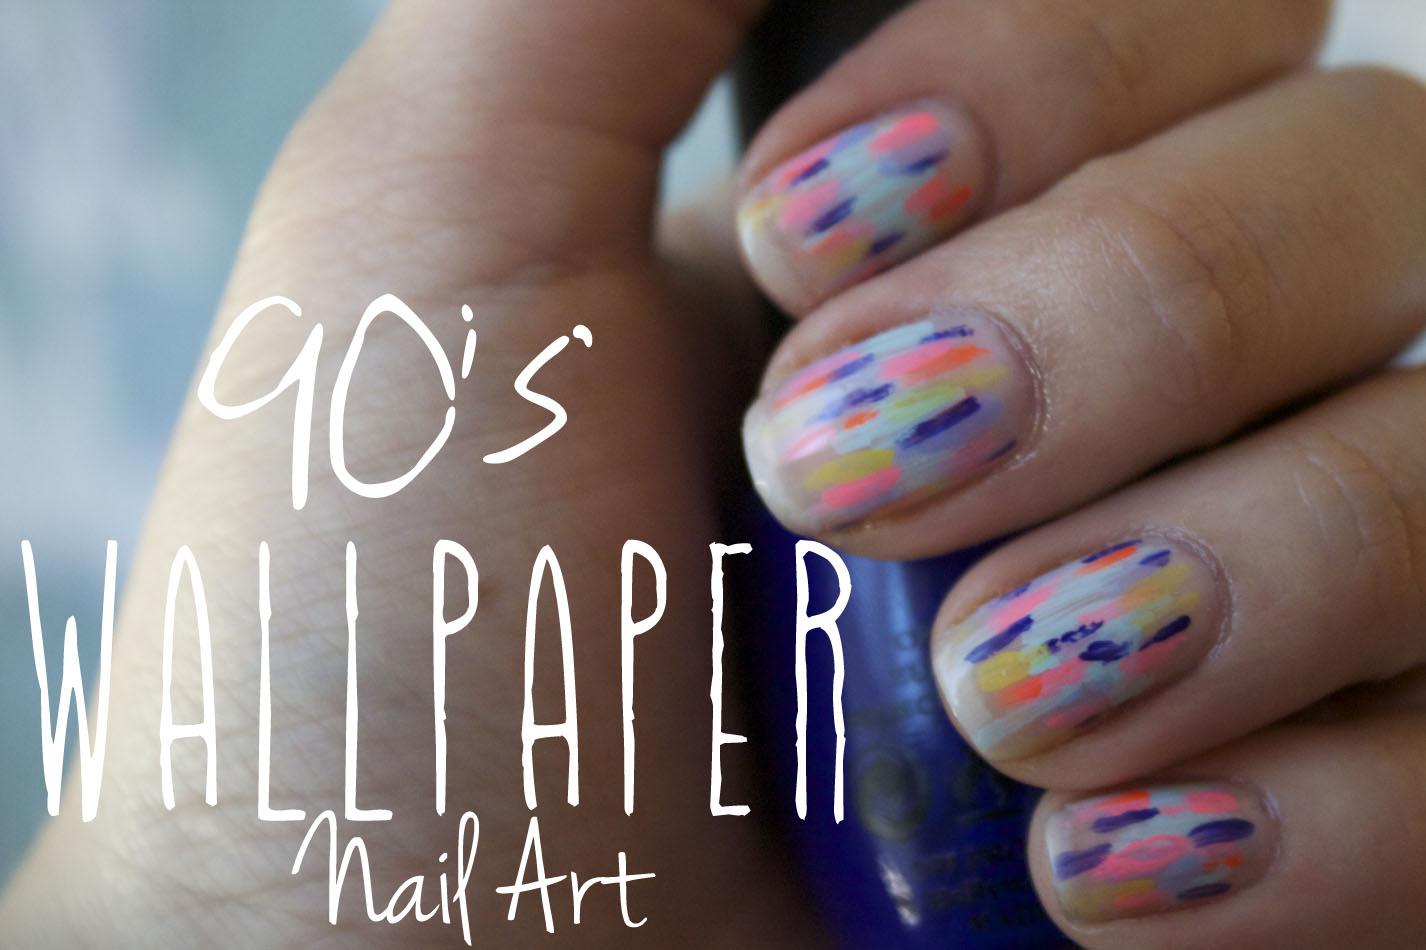 90u0027s Wallpaper Inspired Nail Art u2013 Easy